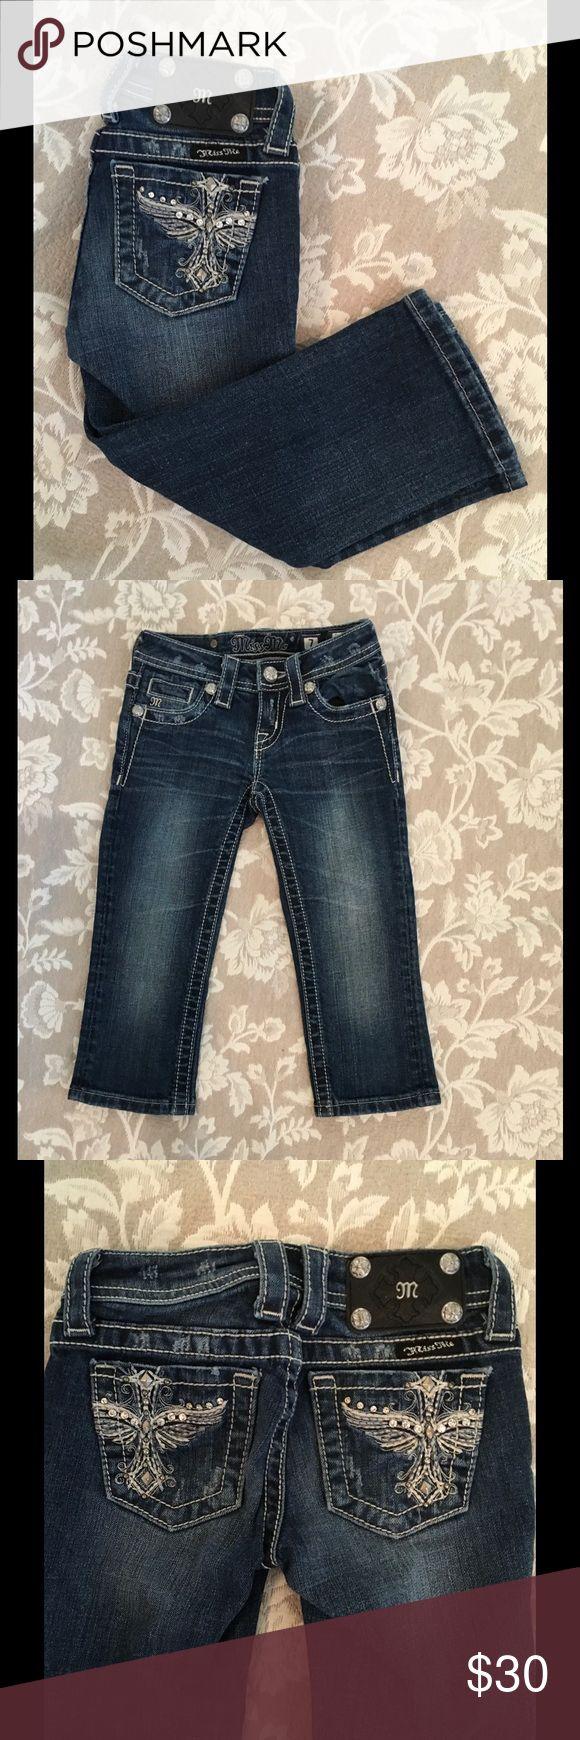 Girls Miss Me Capri jeans Sz 7 In excellent condition girls Capri jeans Miss Me Bottoms Jeans